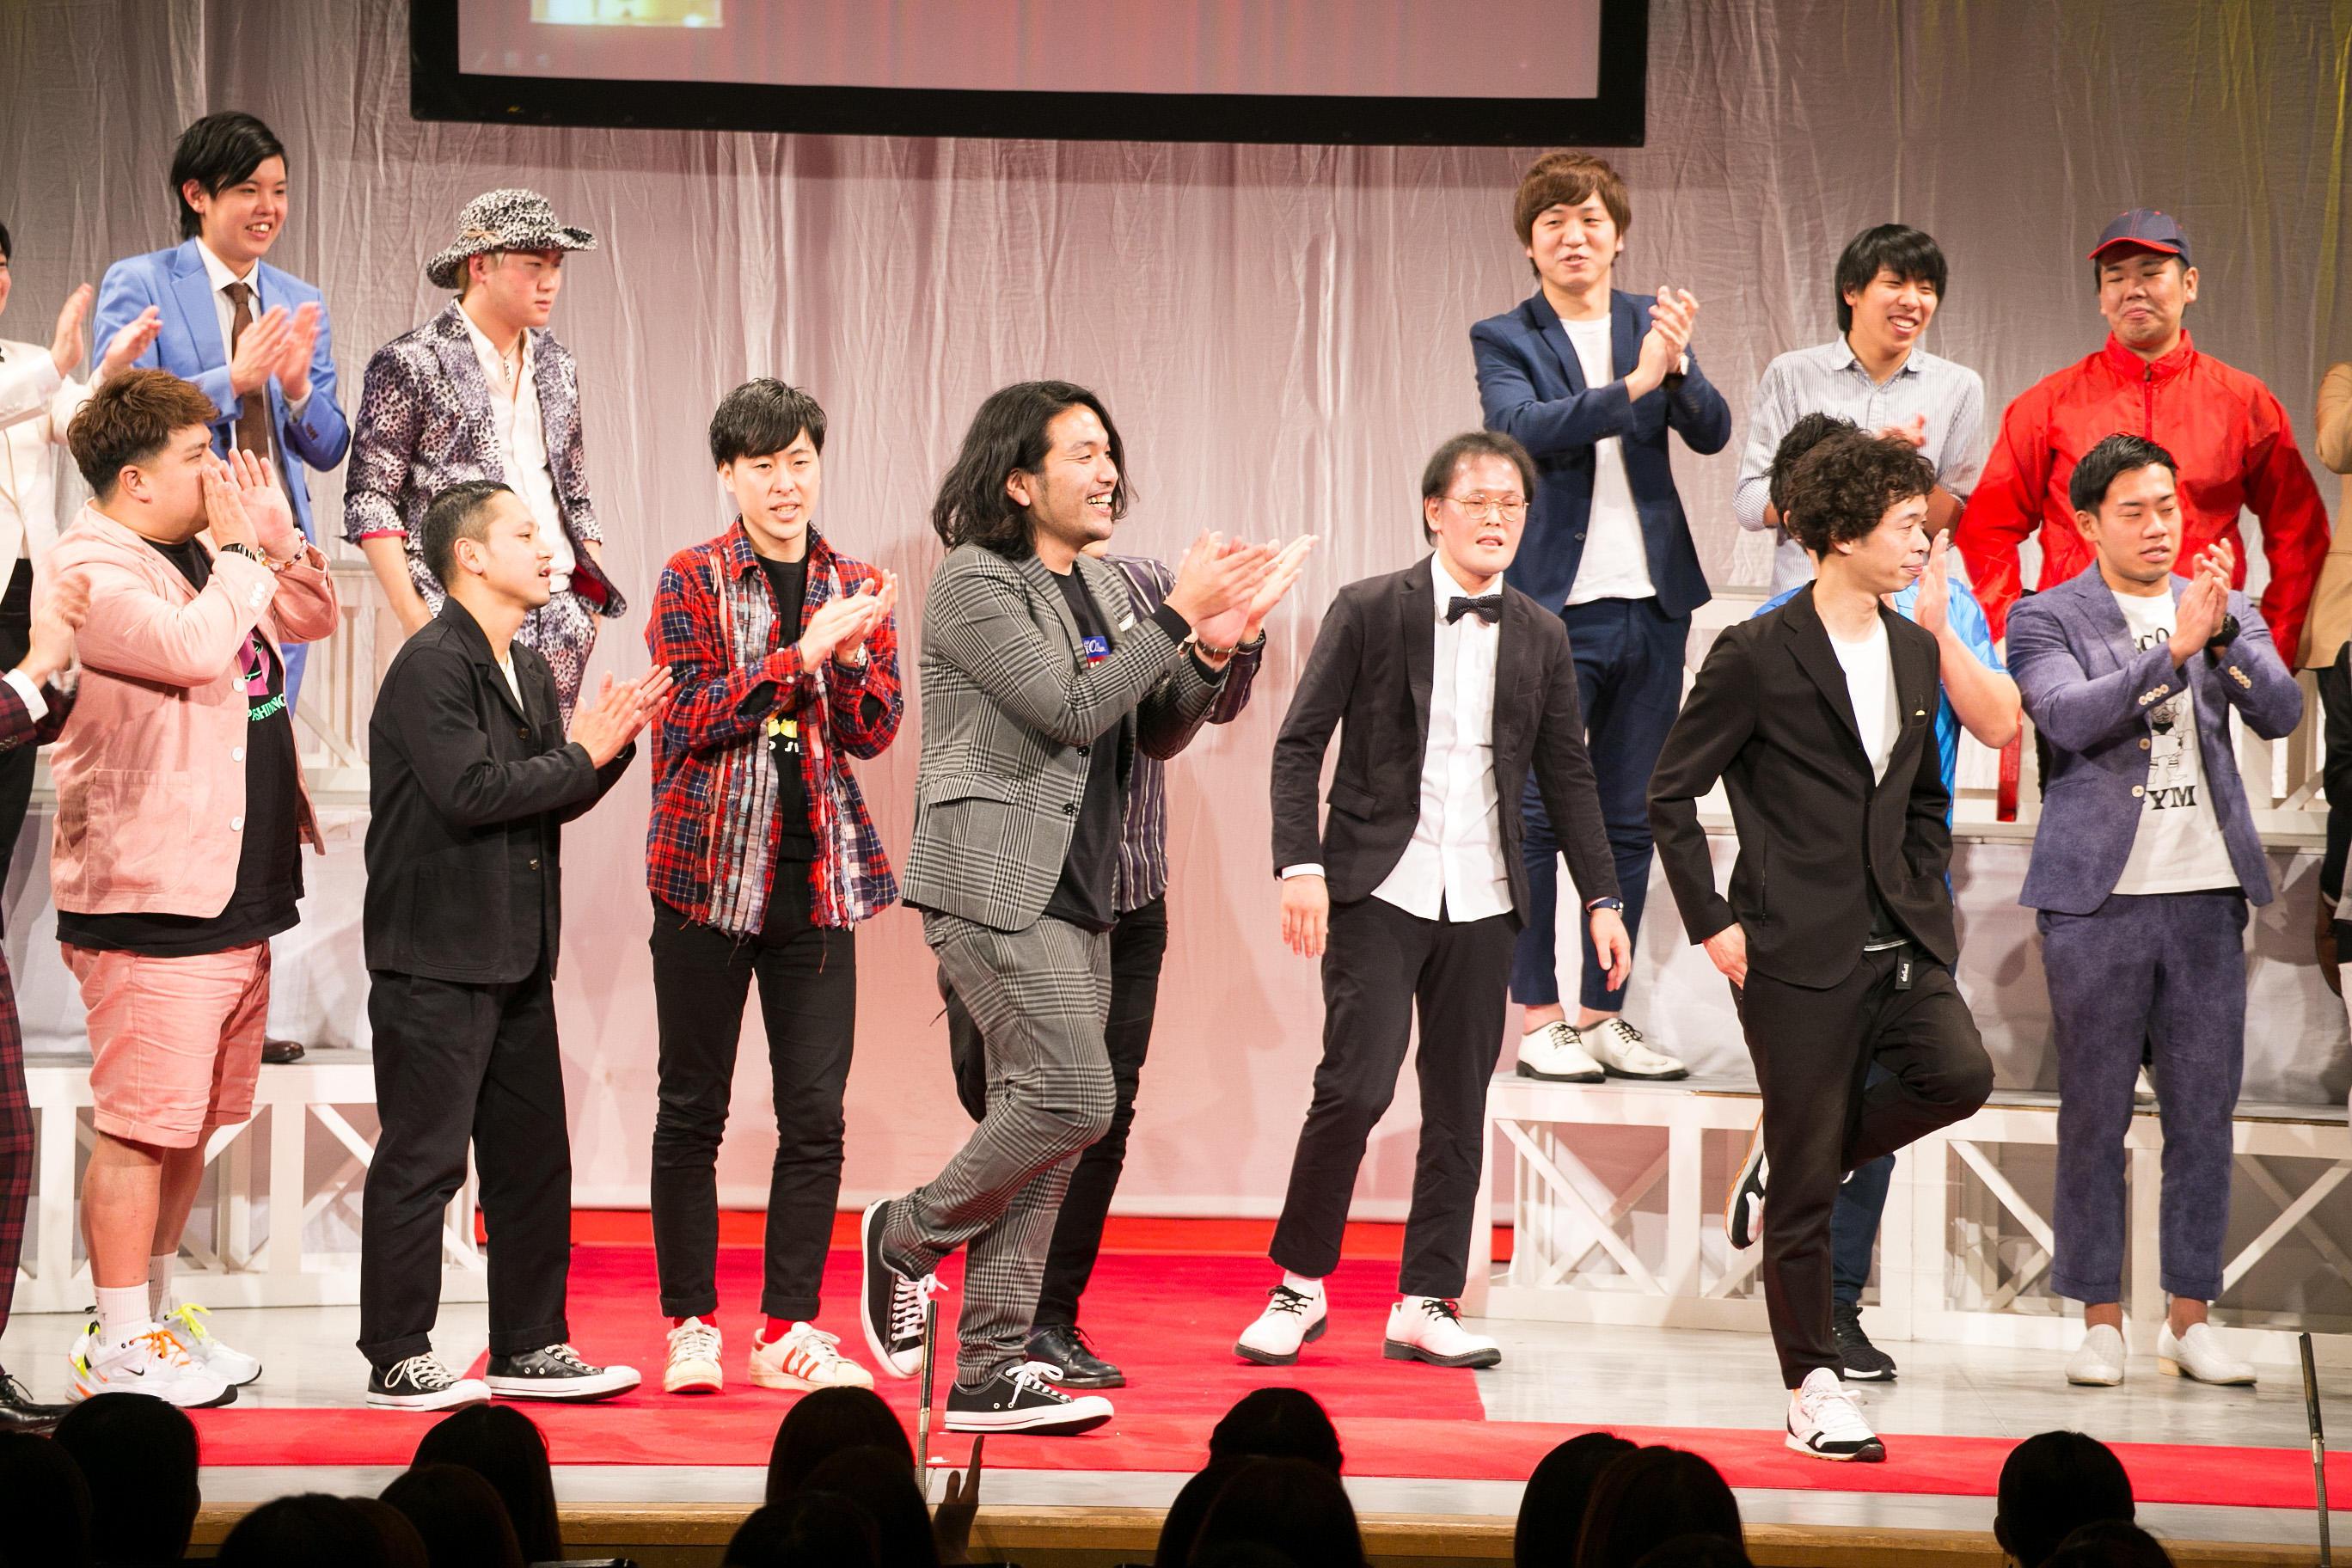 http://news.yoshimoto.co.jp/20181228112013-62b66c75203364dac61aaa79fabfa884acf4a3d2.jpg